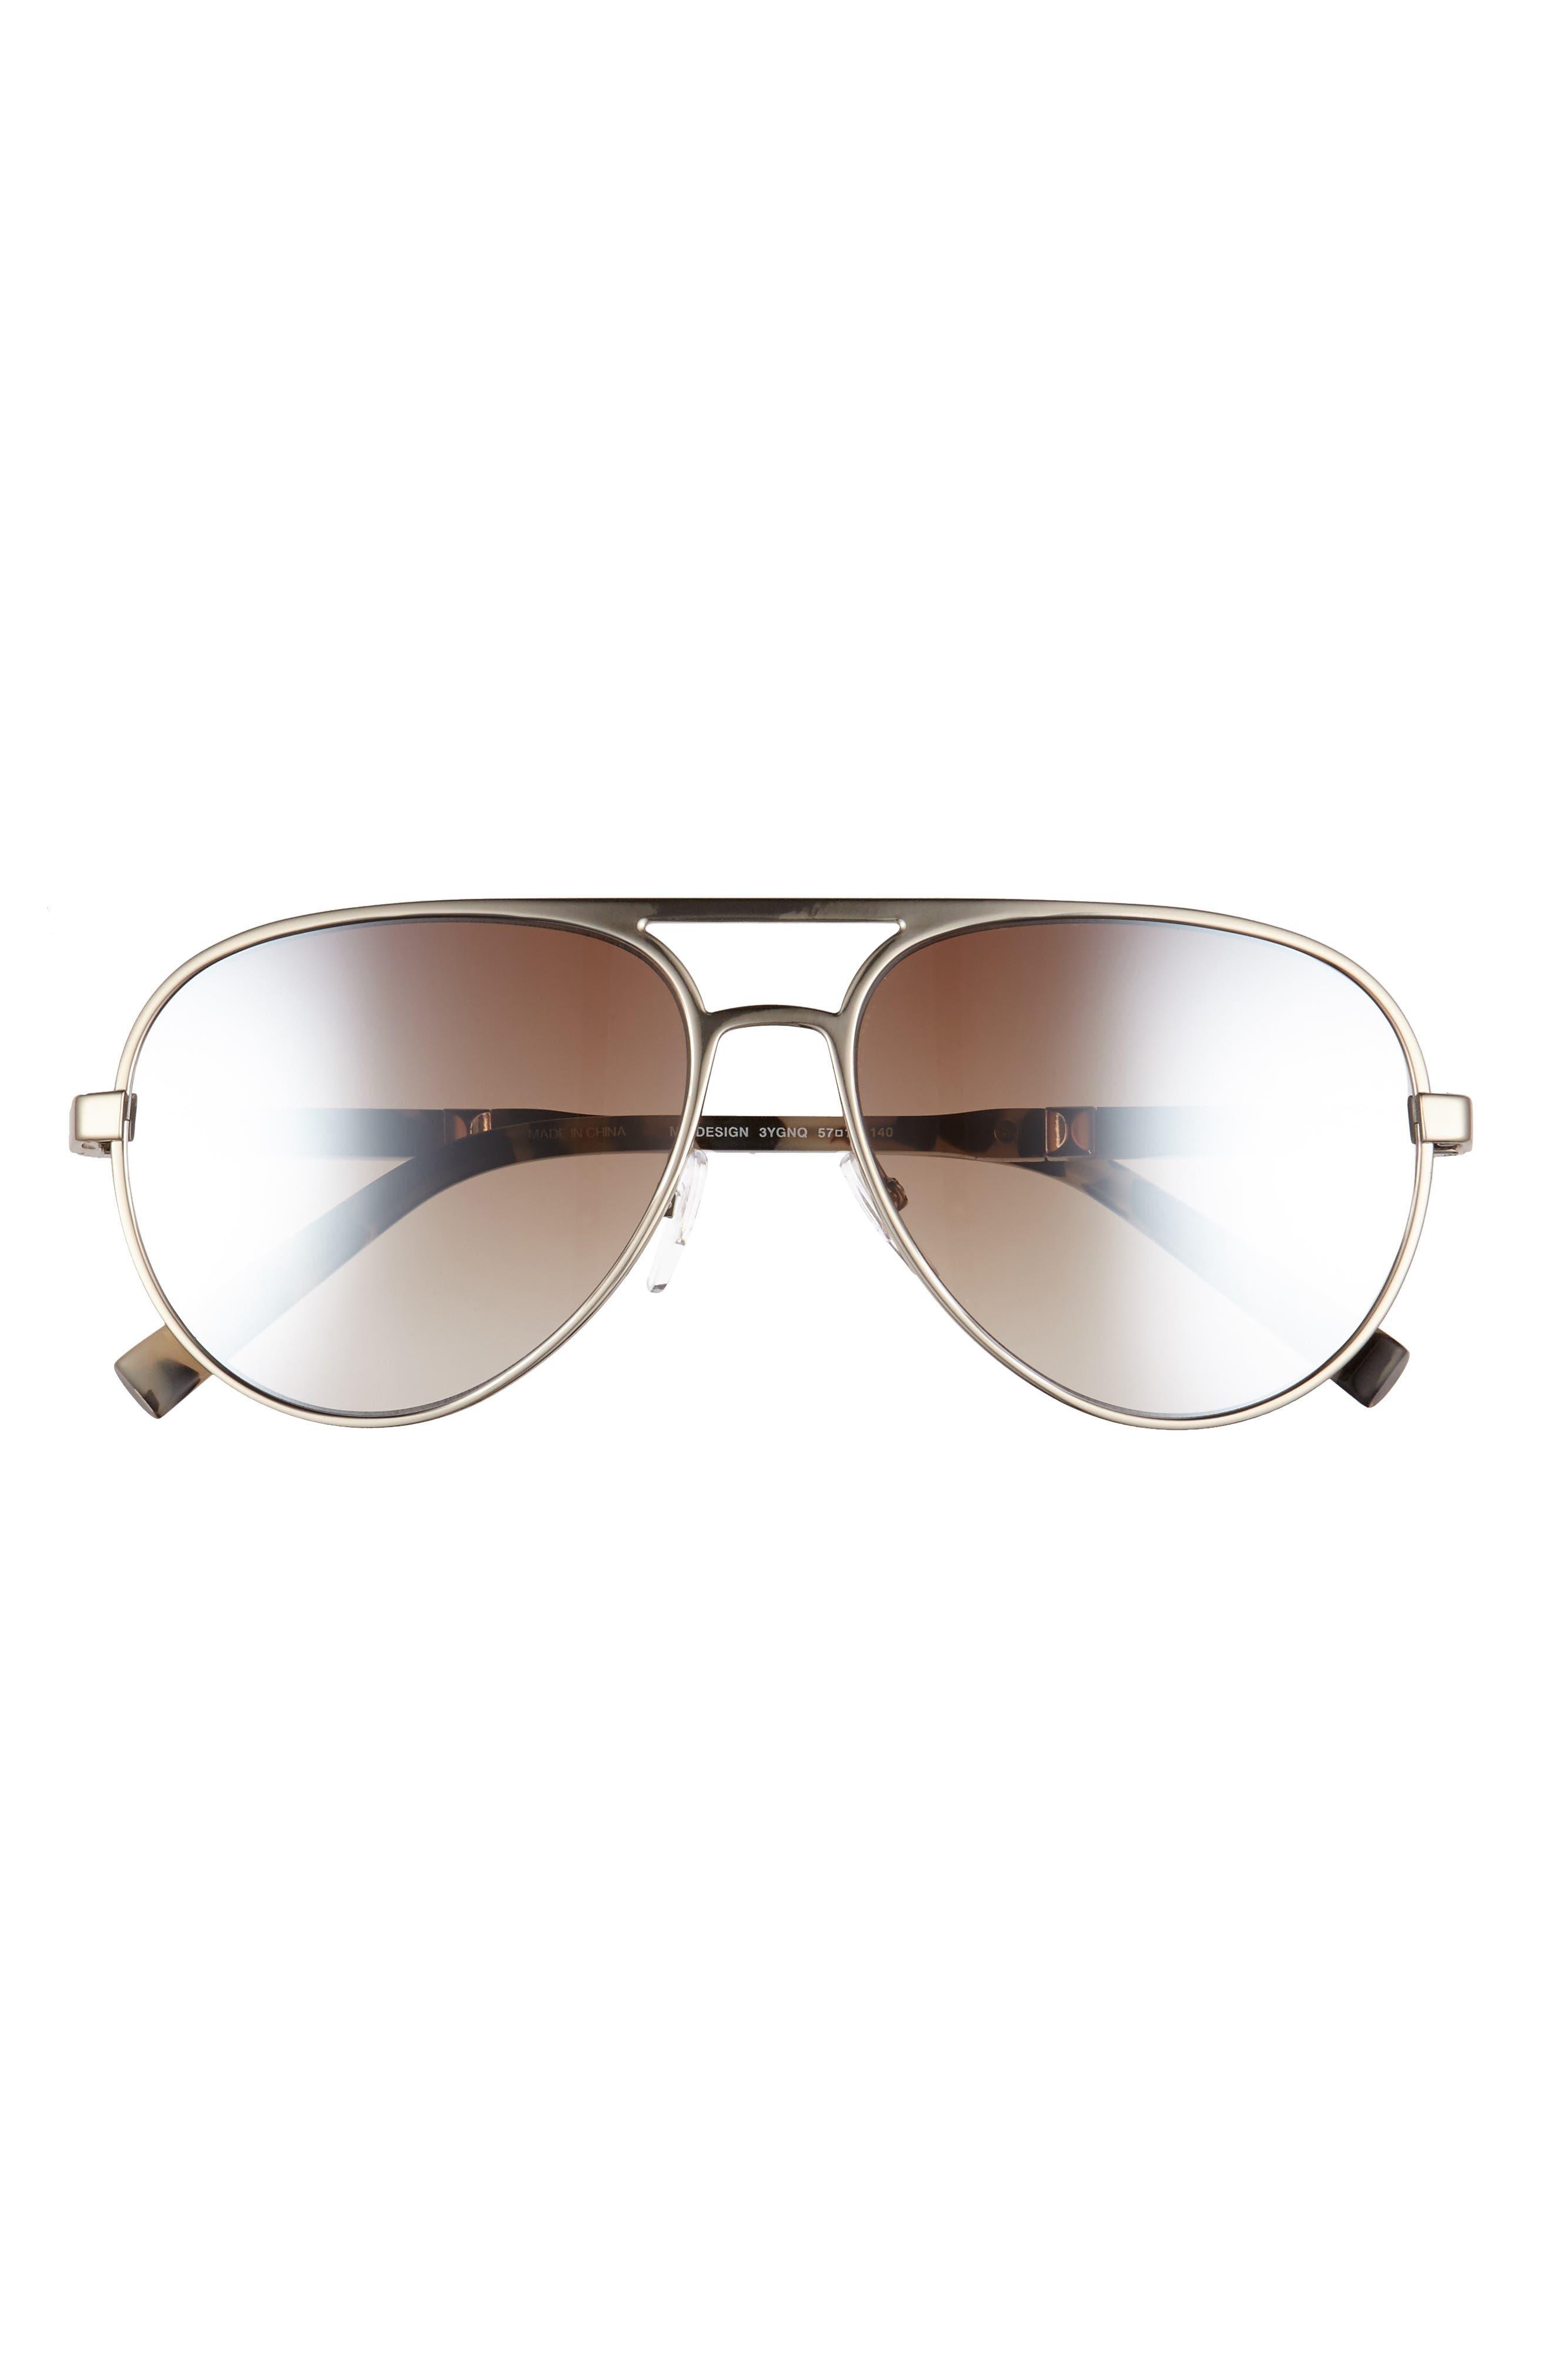 Desigs 57mm Gradient Aviator Sunglasses,                             Alternate thumbnail 6, color,